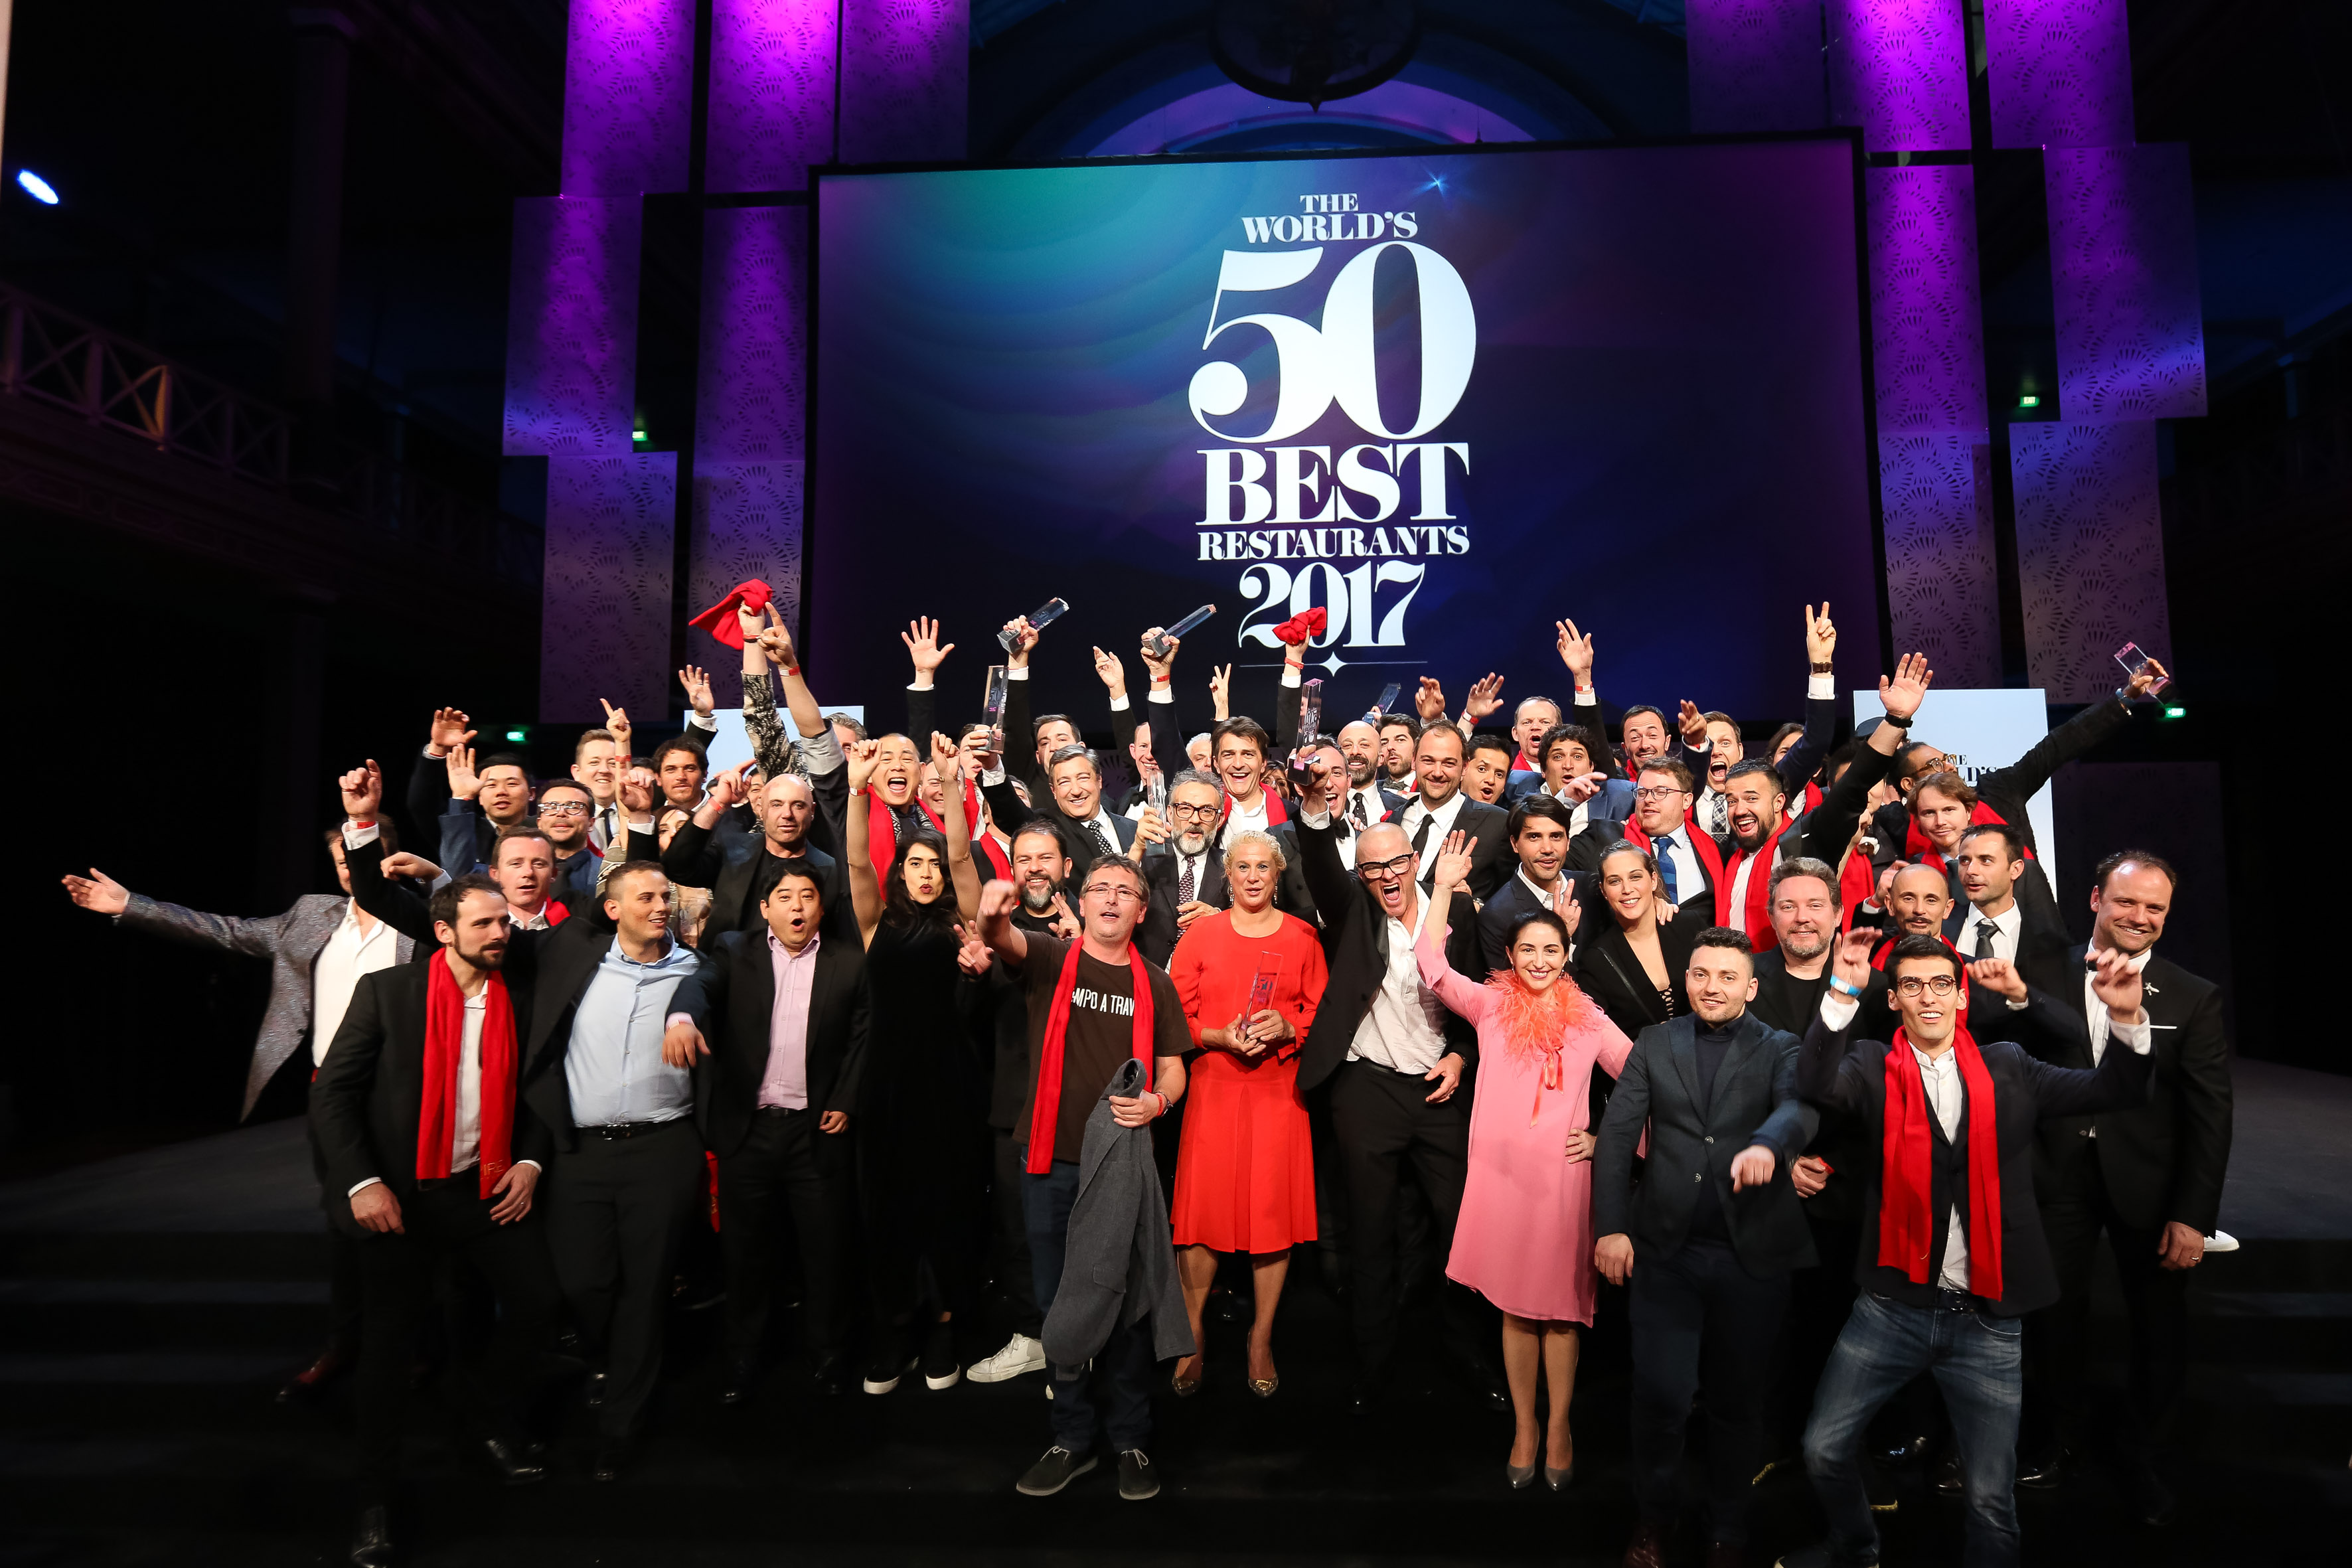 Eleven Madison Park tops World's 50 Best